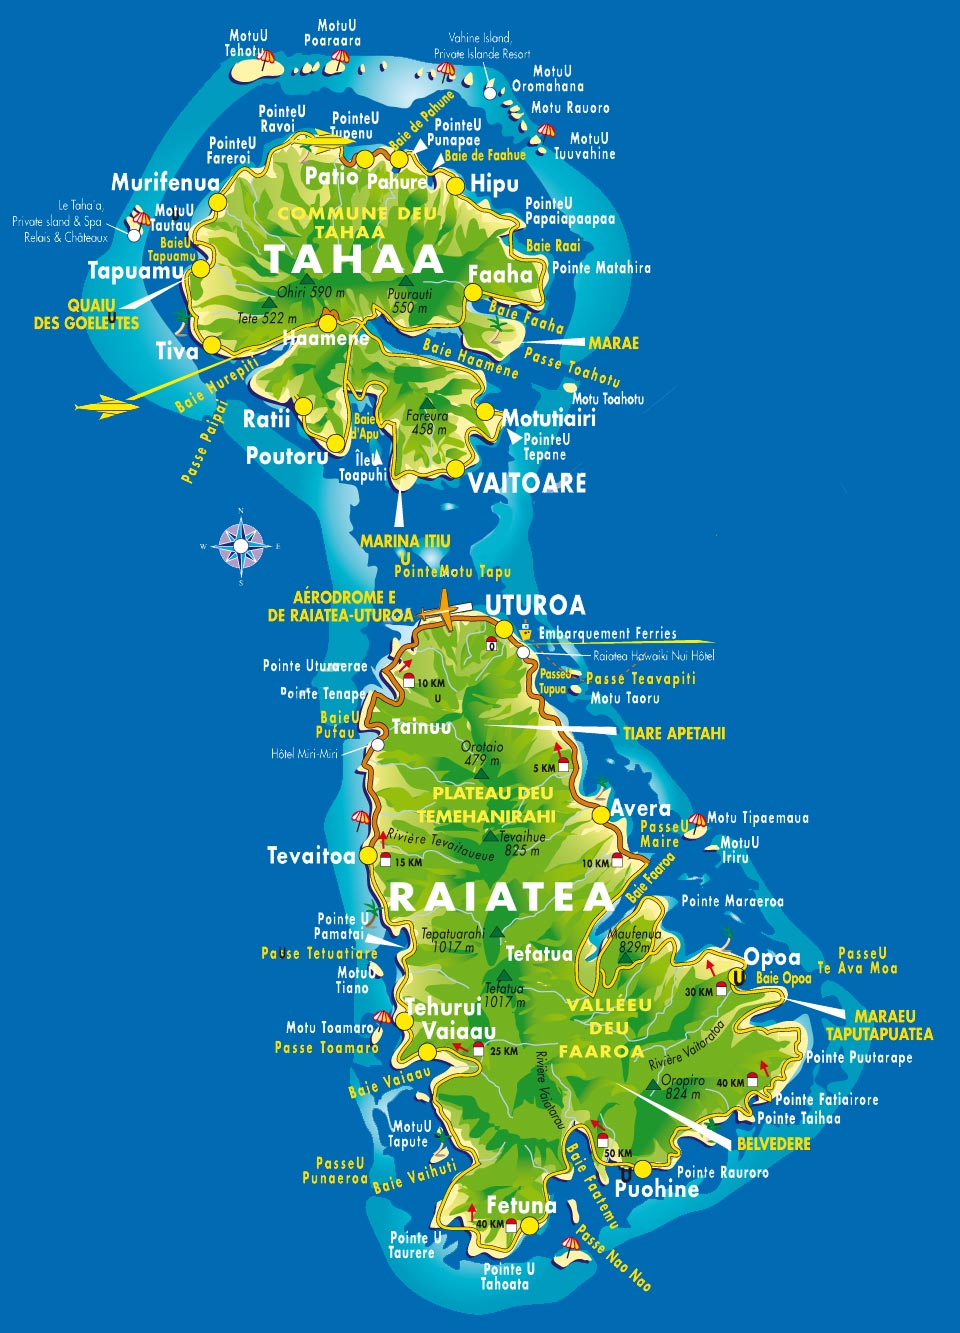 carte des îles Raiatea et Tahaa